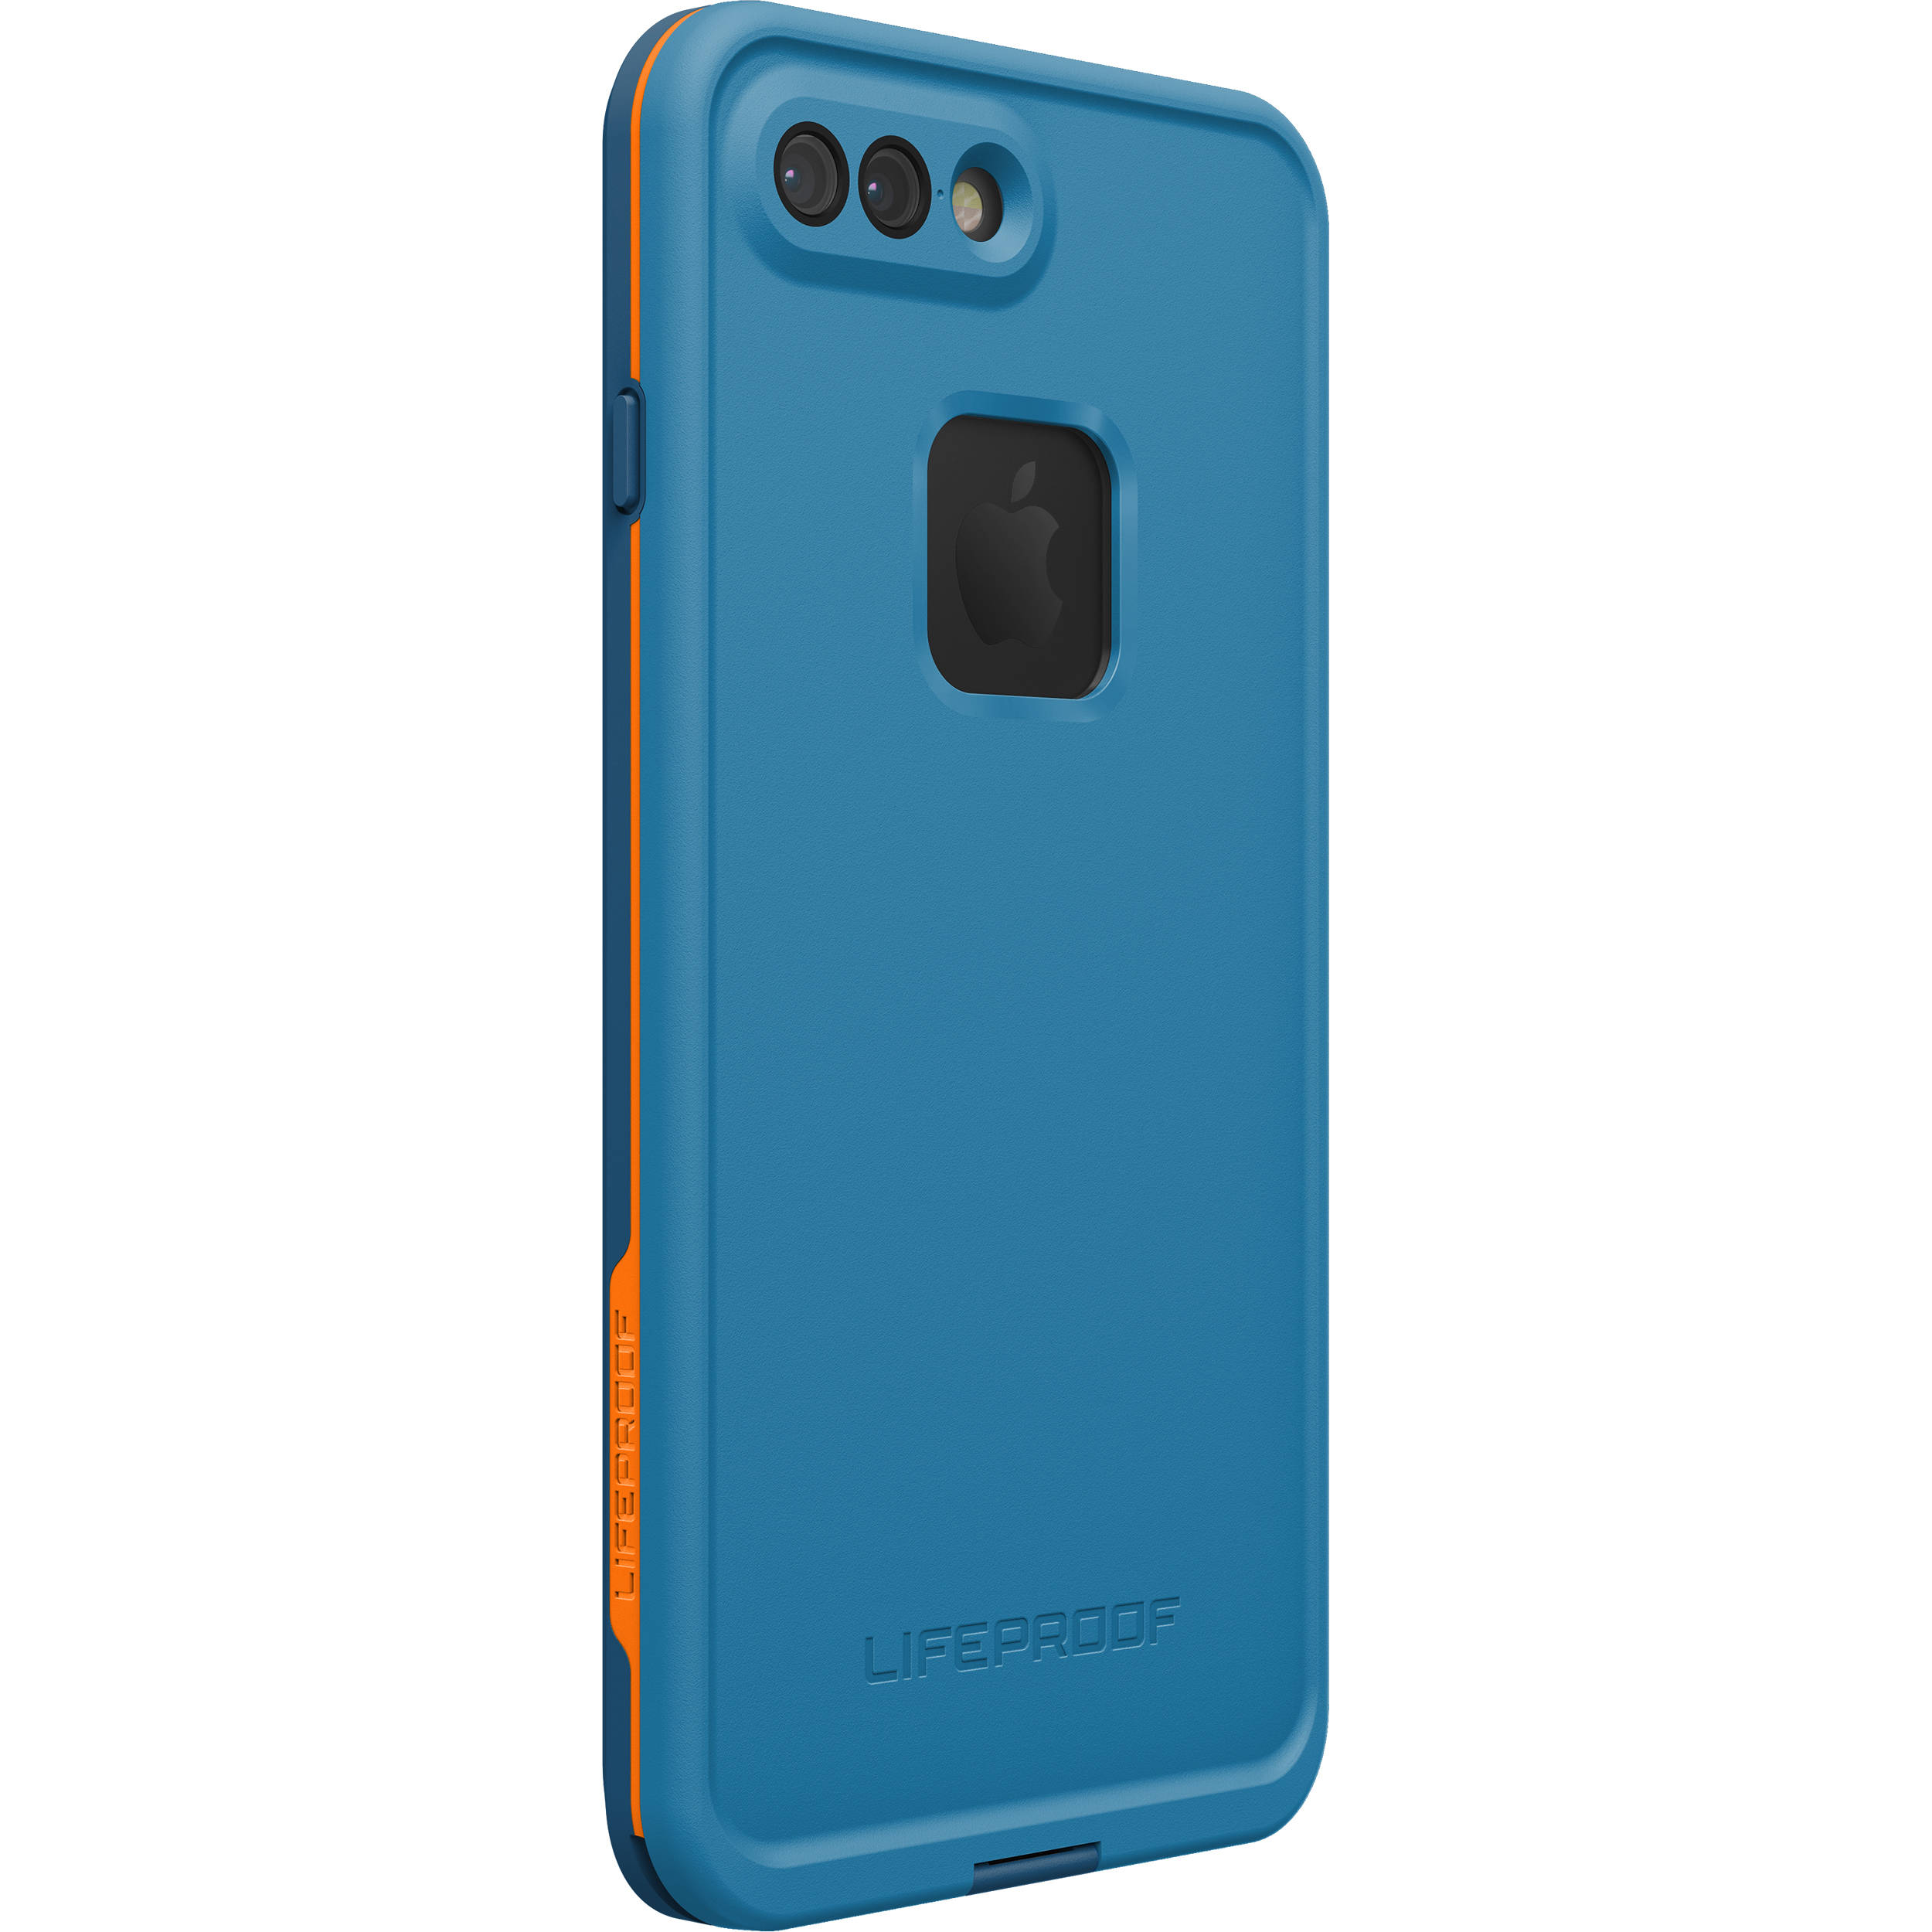 LifeProof fr  Case for iPhone 7 Plus (Base Camp BLue) 77-54000 6b18224cf4ff1